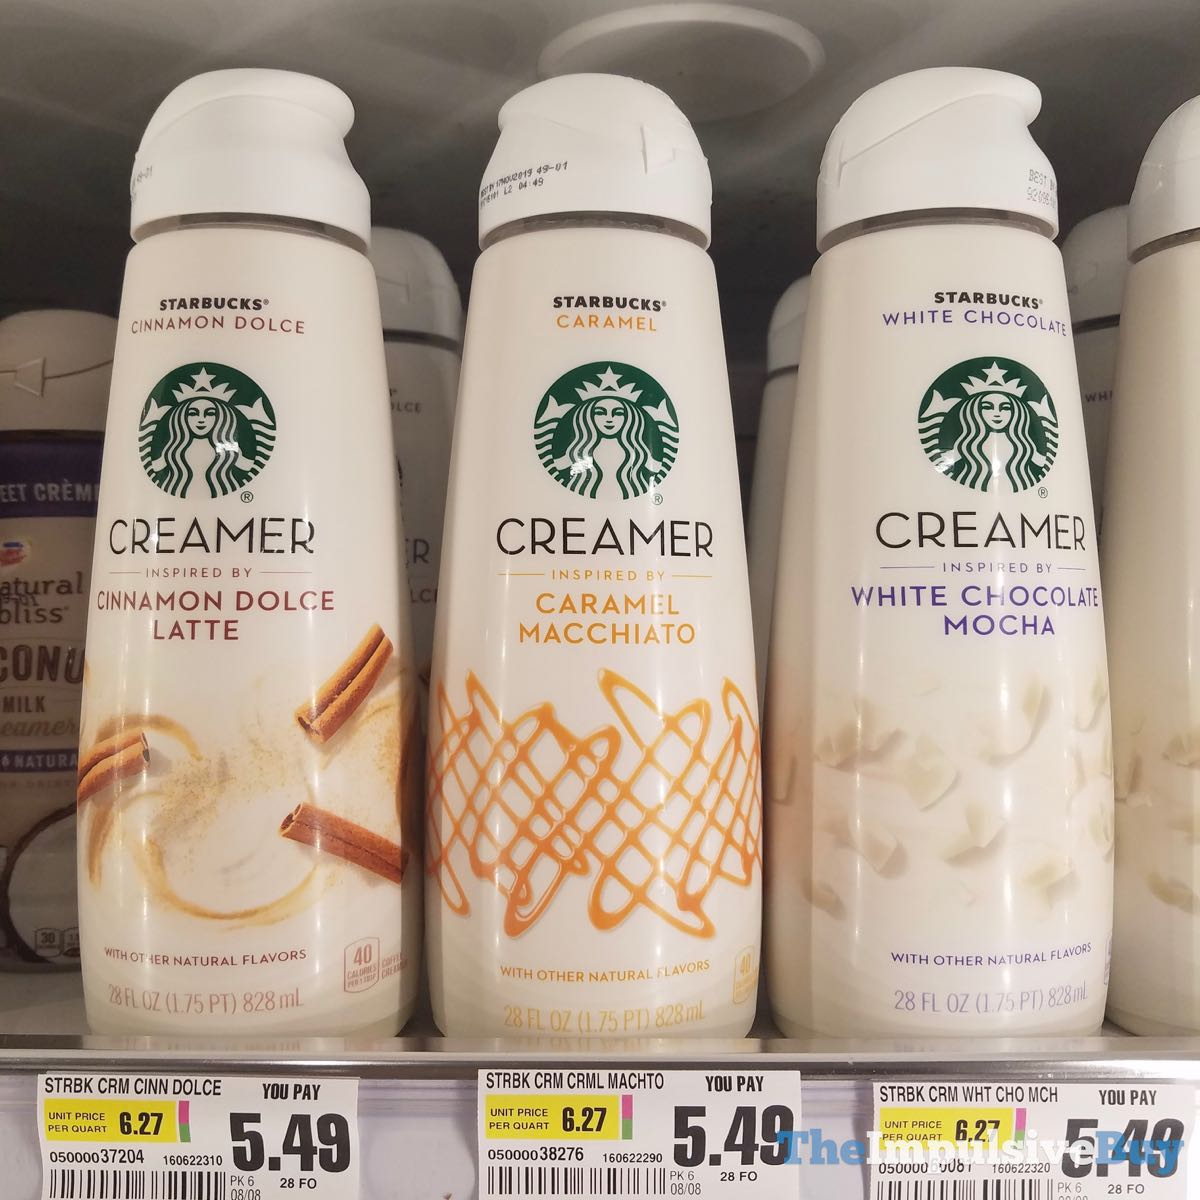 Starbucks-Creamers-Cinnamon-Dolce-Latte-Caramel-Macchiato